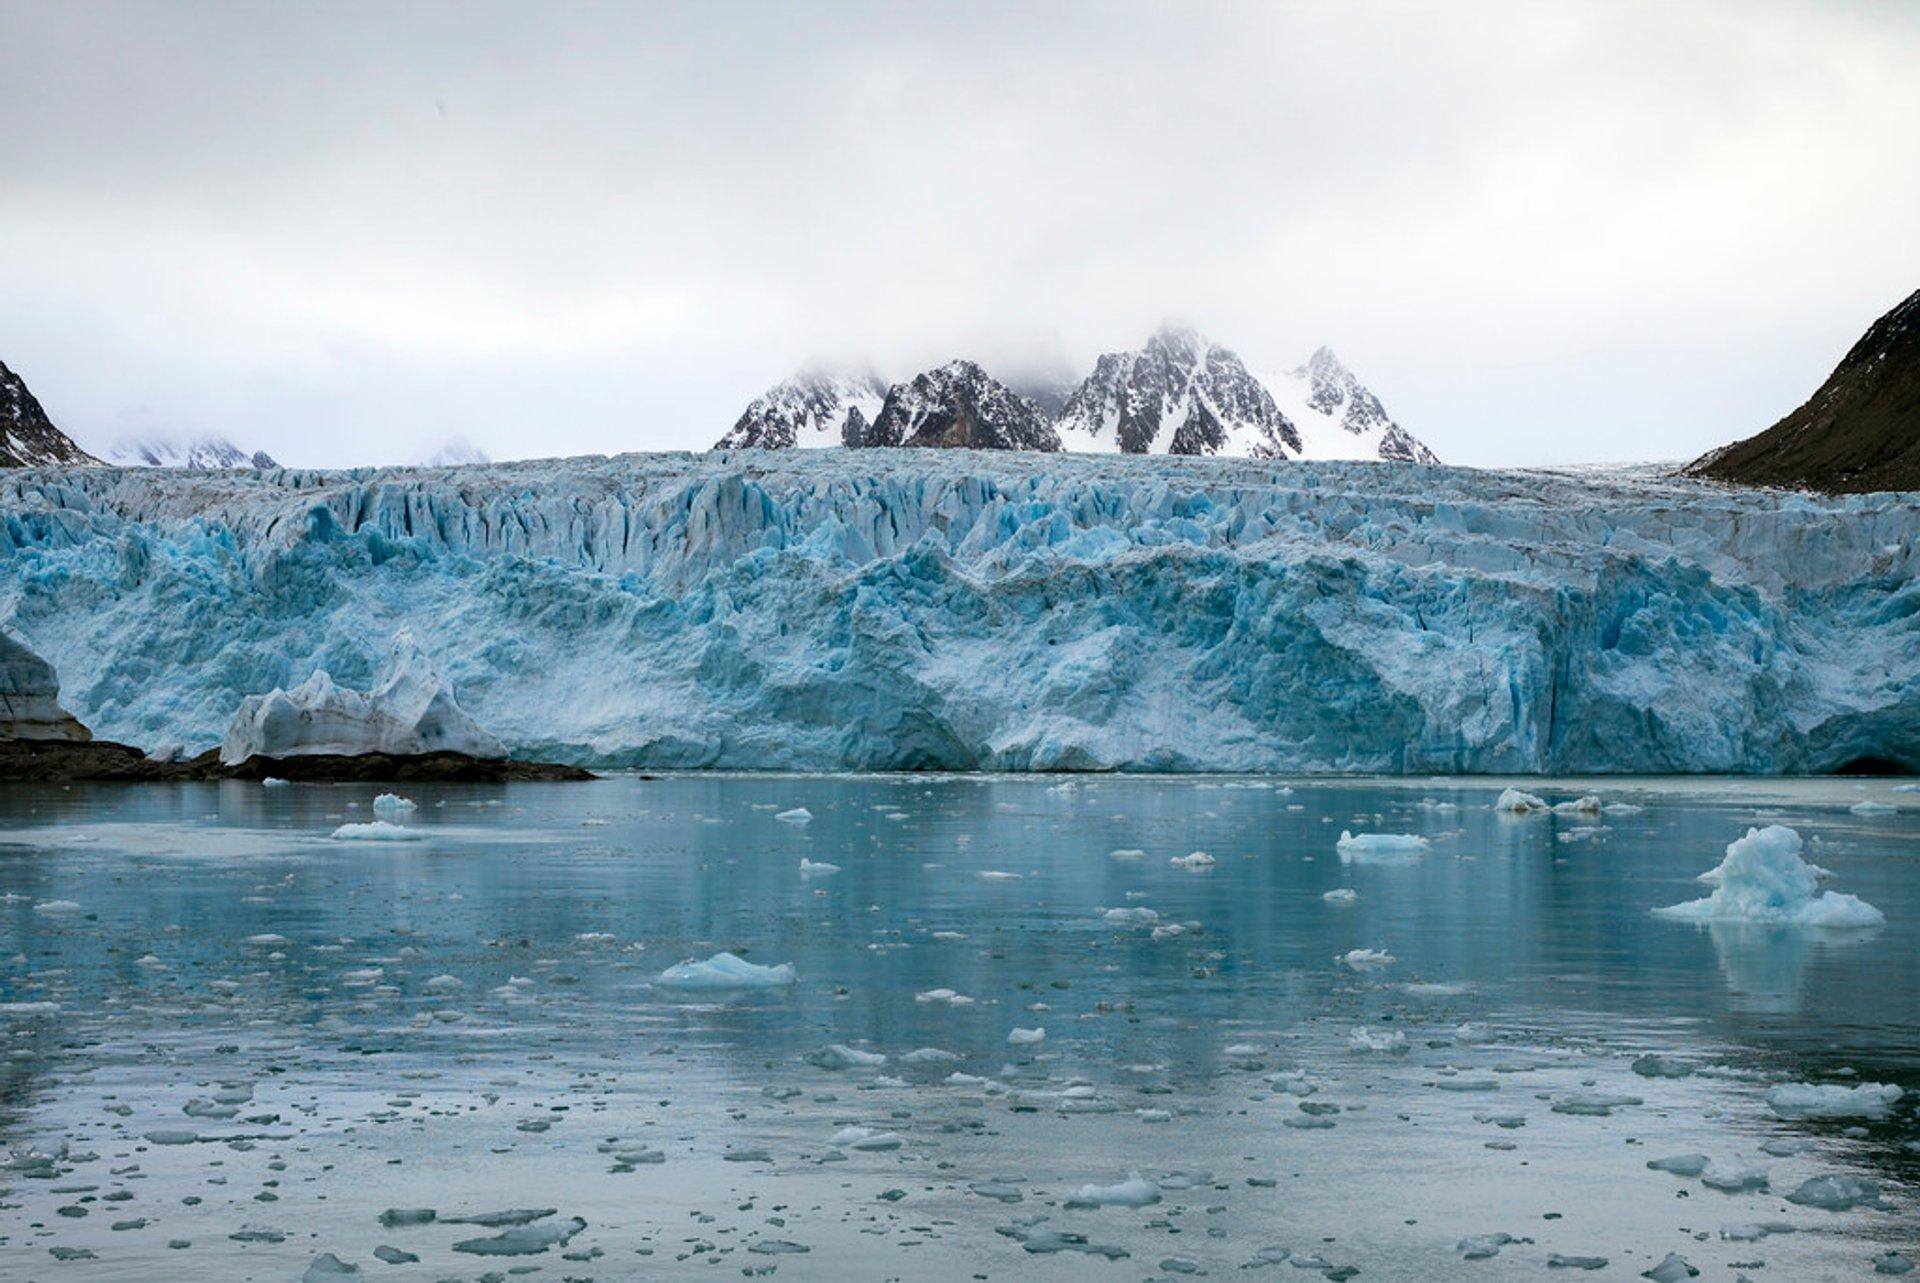 Nordenskiöldbreen Glacier 2019